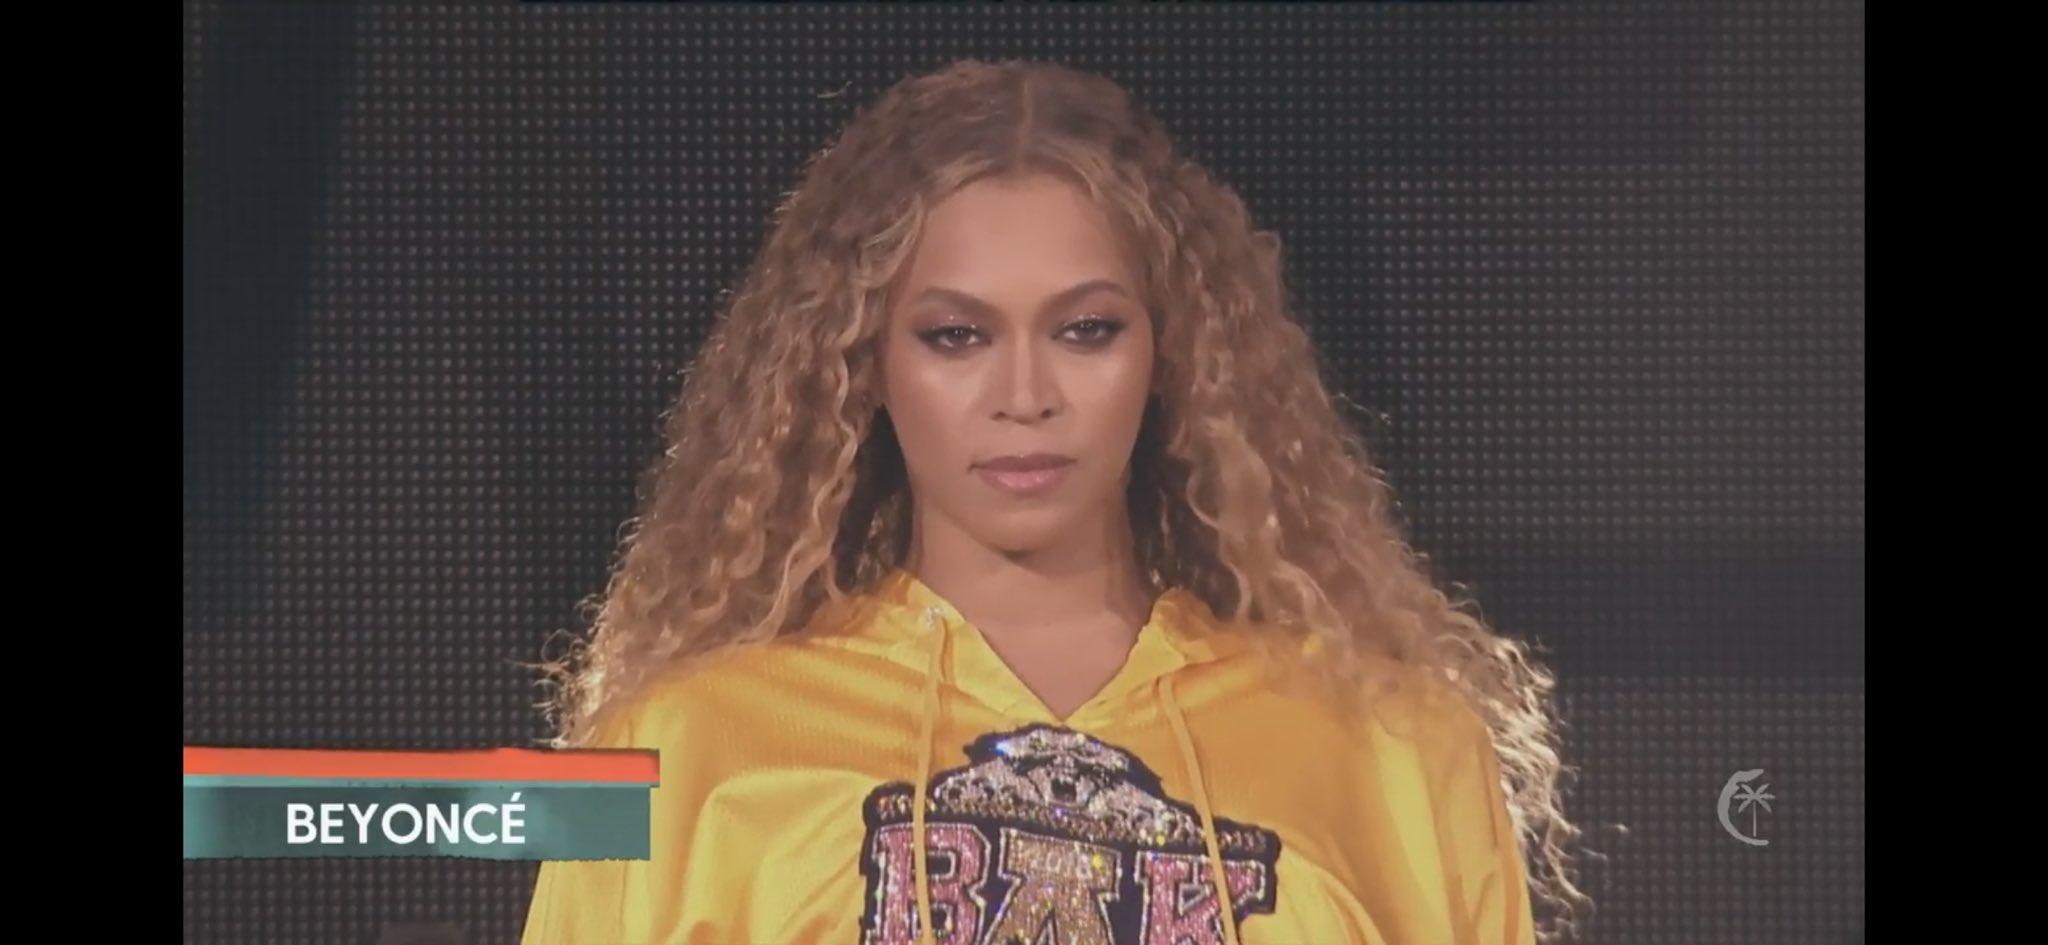 Beyoncé is Flawless. #Beychella #Coachella2018 https://t.co/9Q9zfa44Ch